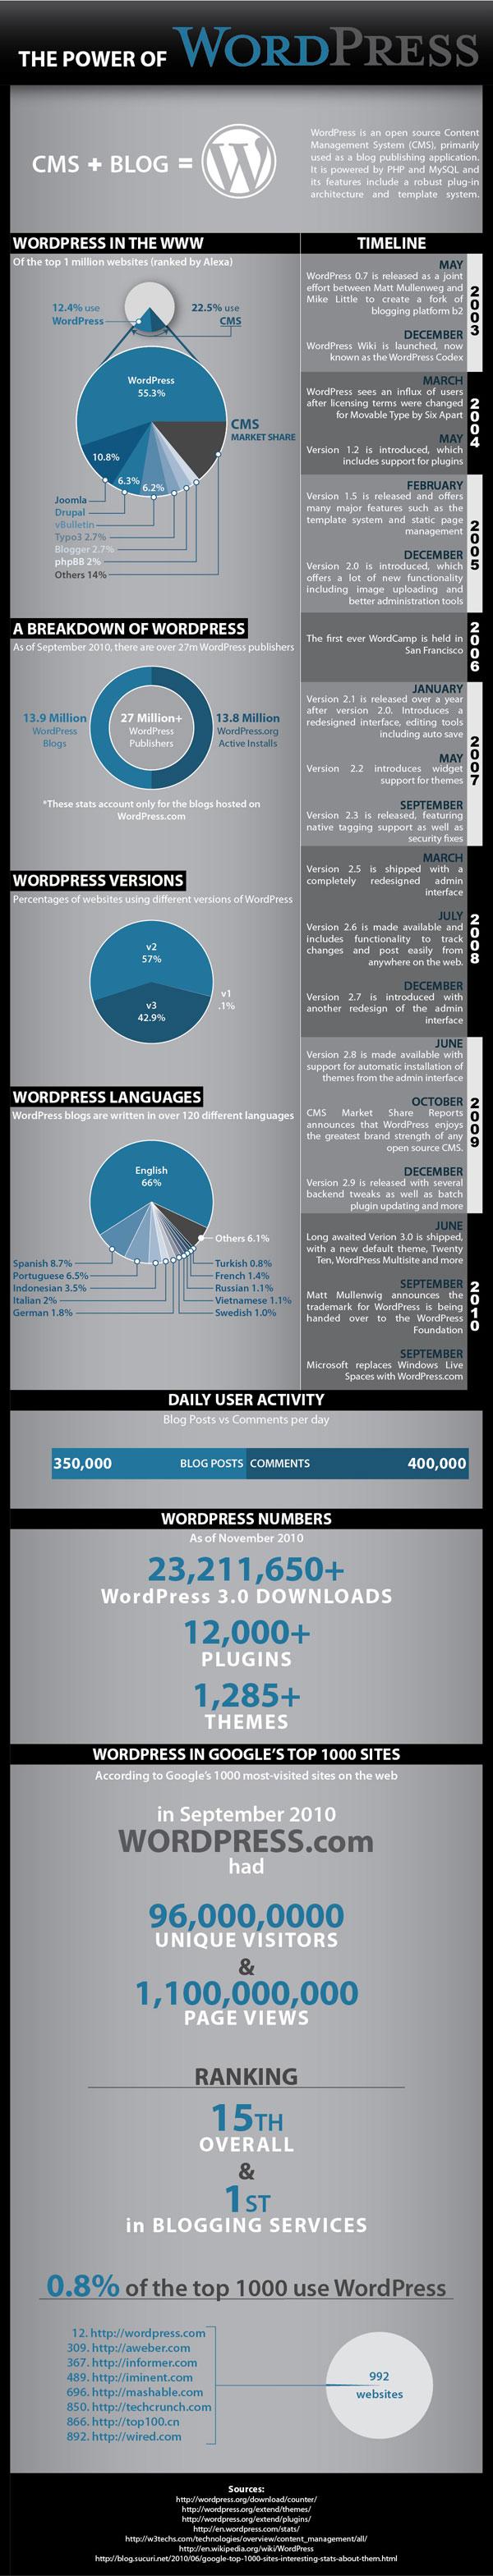 Fancy Anatomy Of A Wordpress Theme Illustration - Anatomy and ...